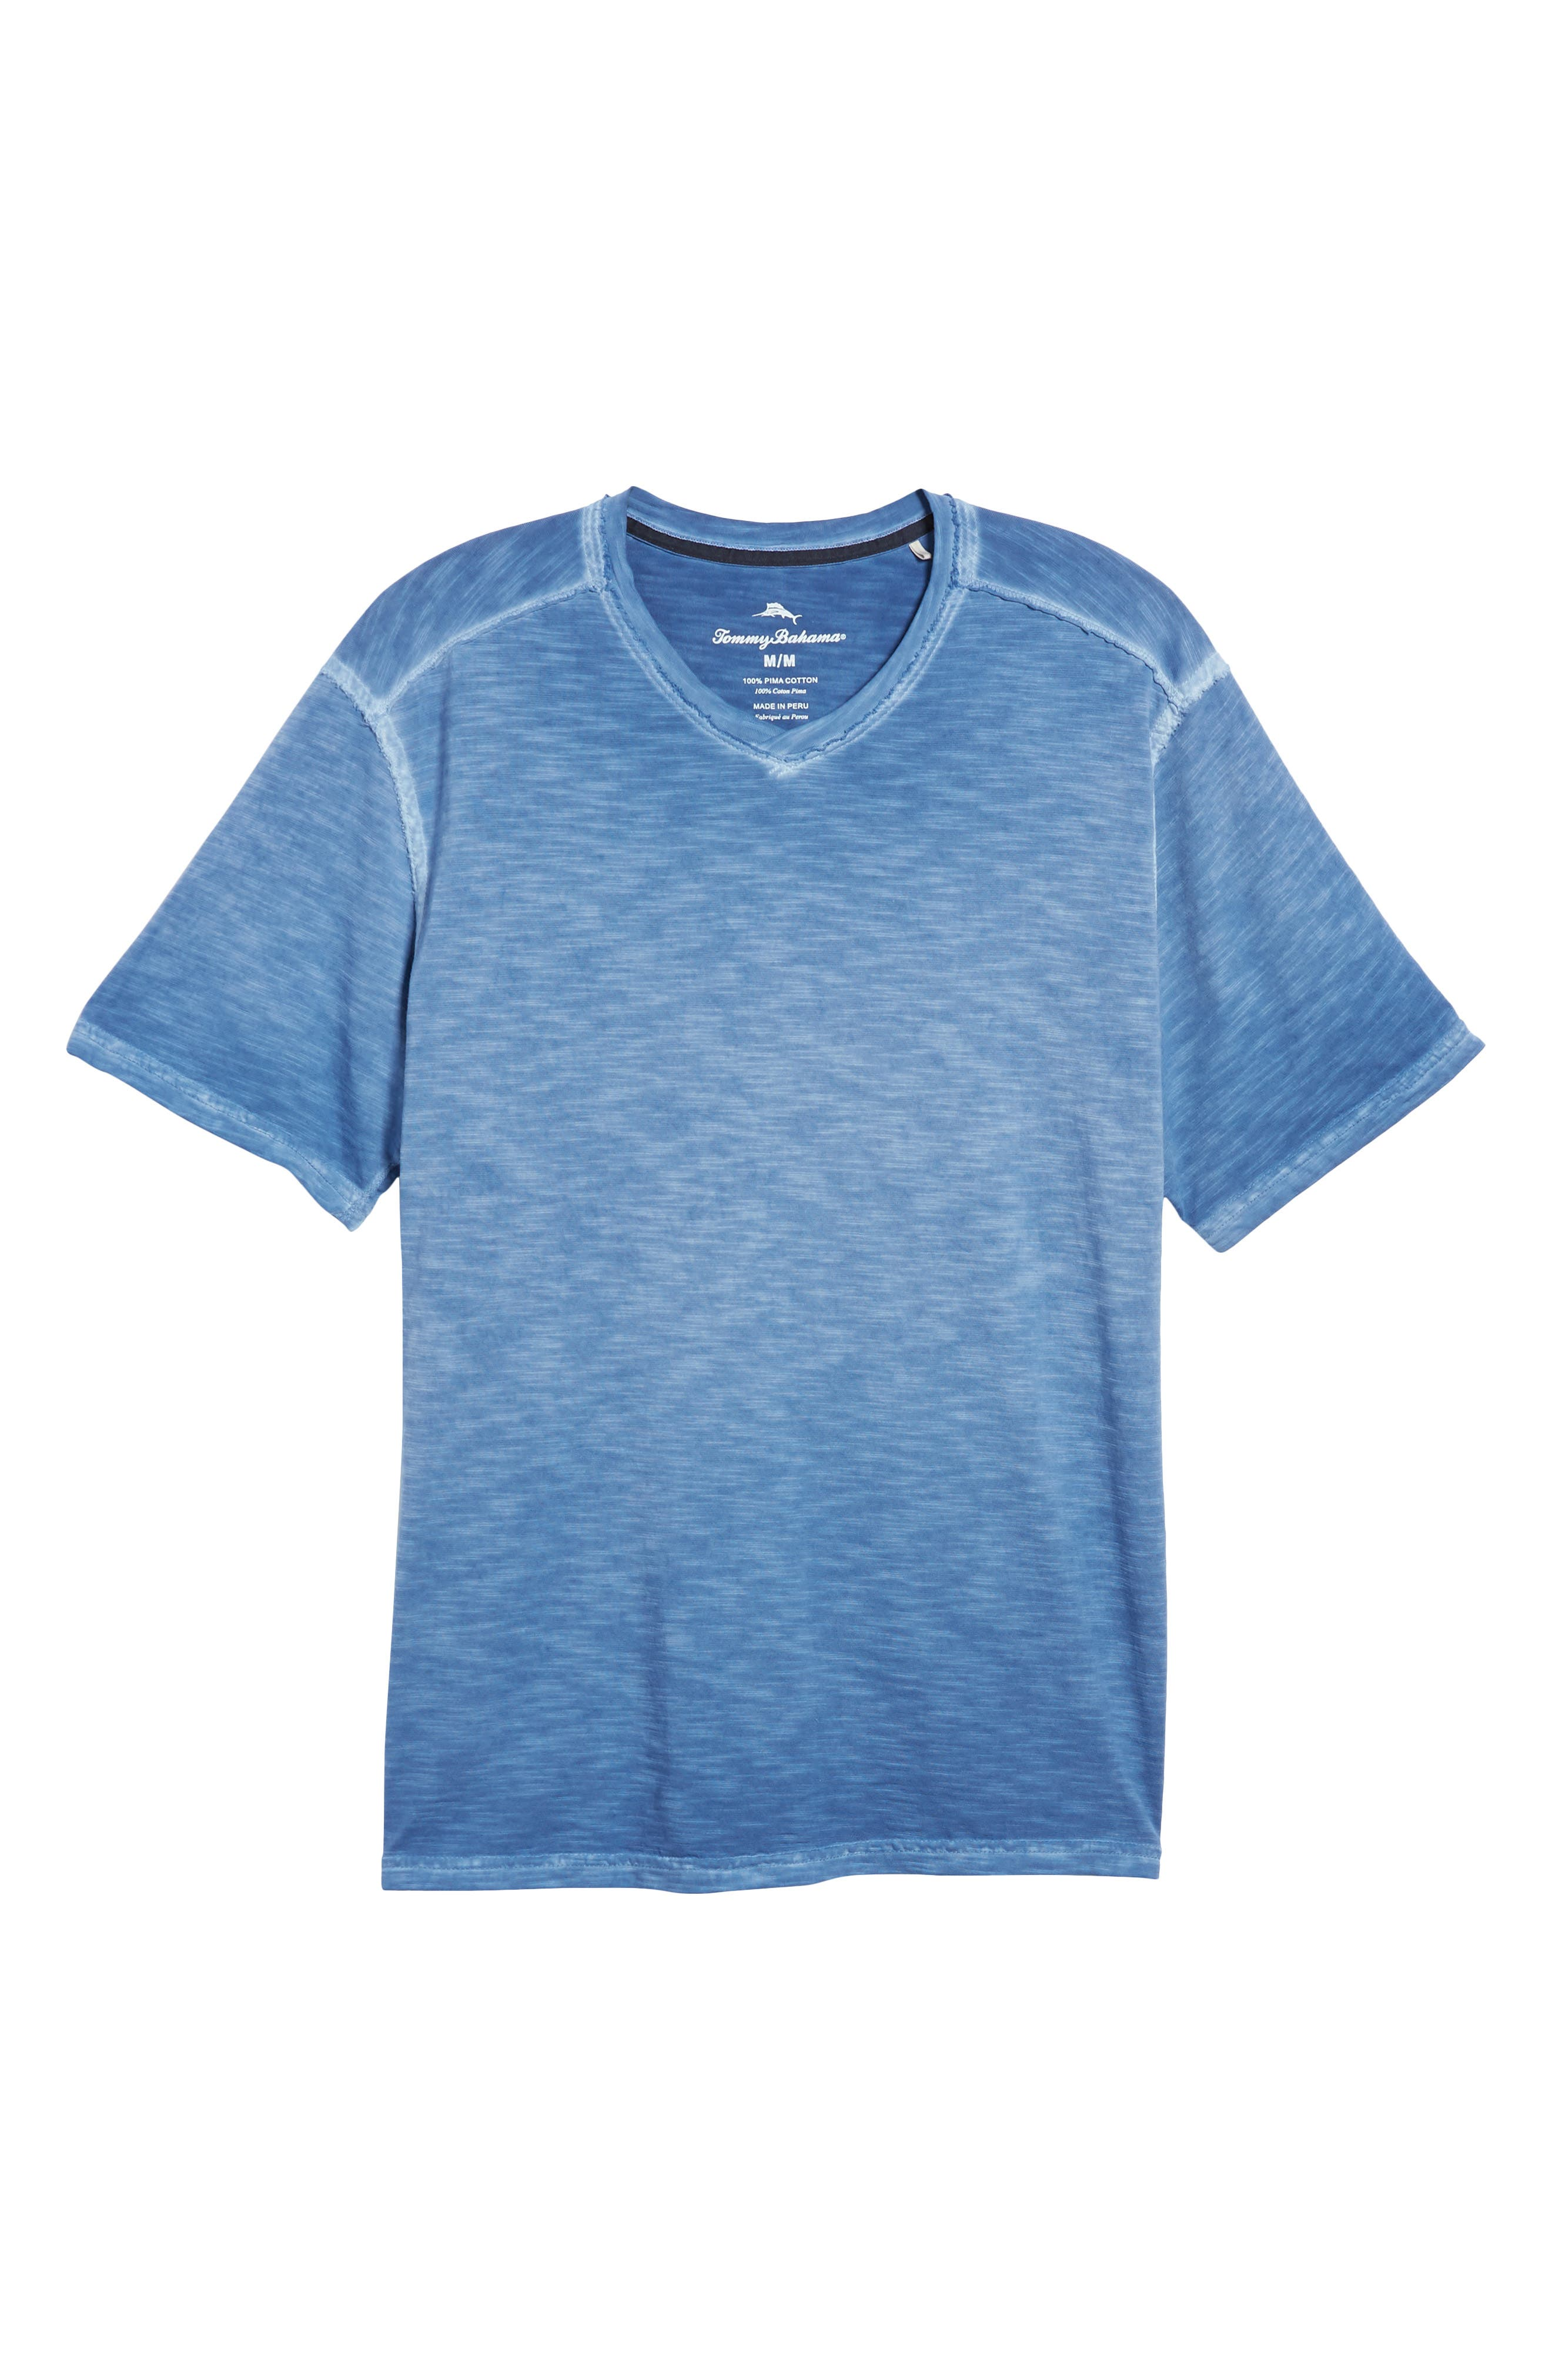 Suncoast Shores V-Neck T-Shirt,                             Alternate thumbnail 6, color,                             Dockside Blue